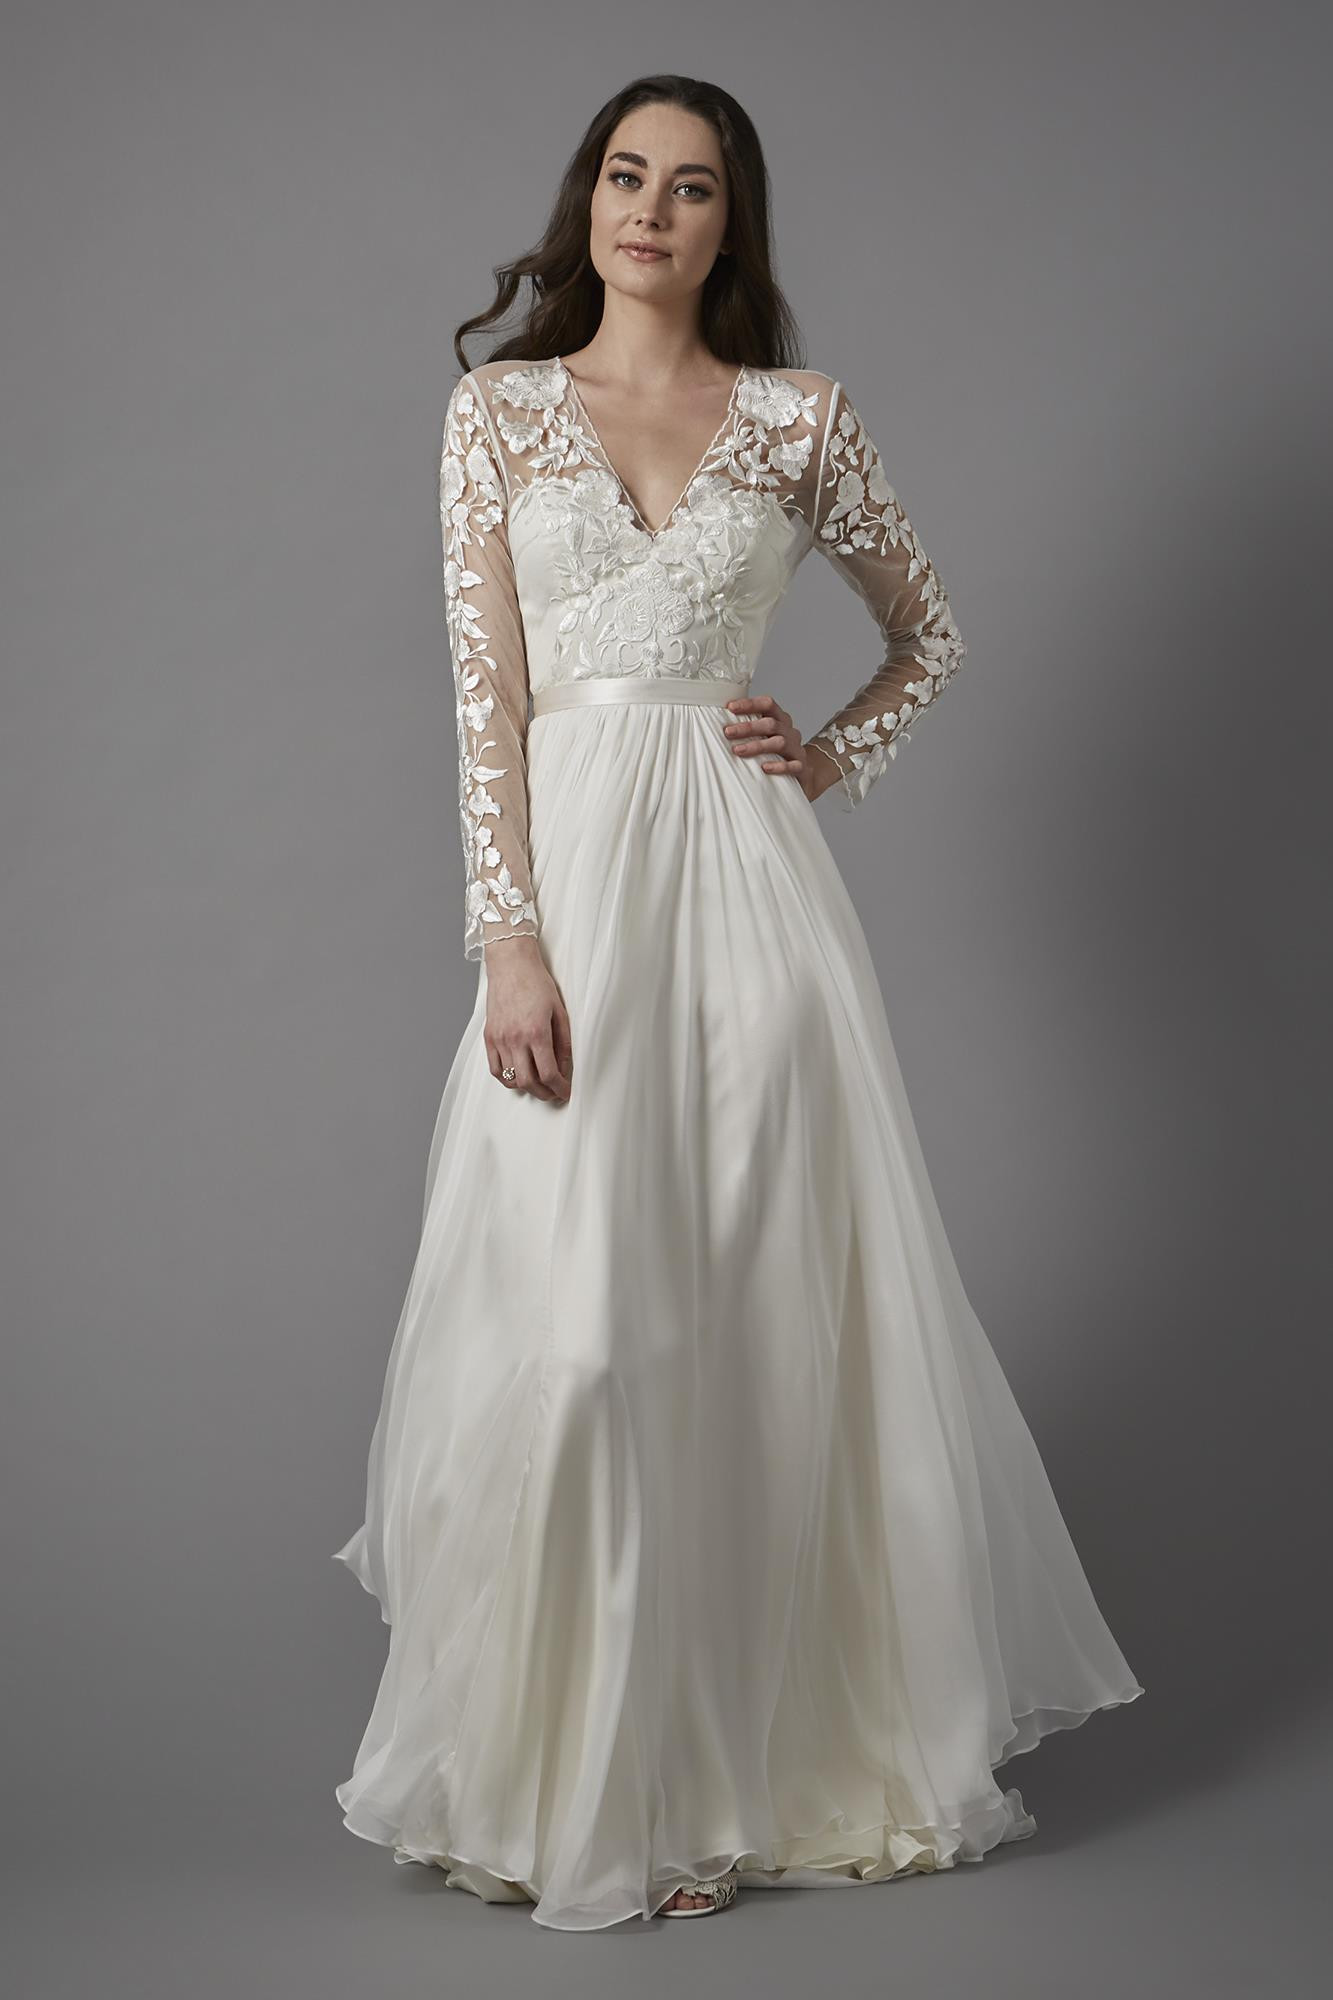 REYNOLDS Wedding Dress from Pronovias - hitched.co.uk